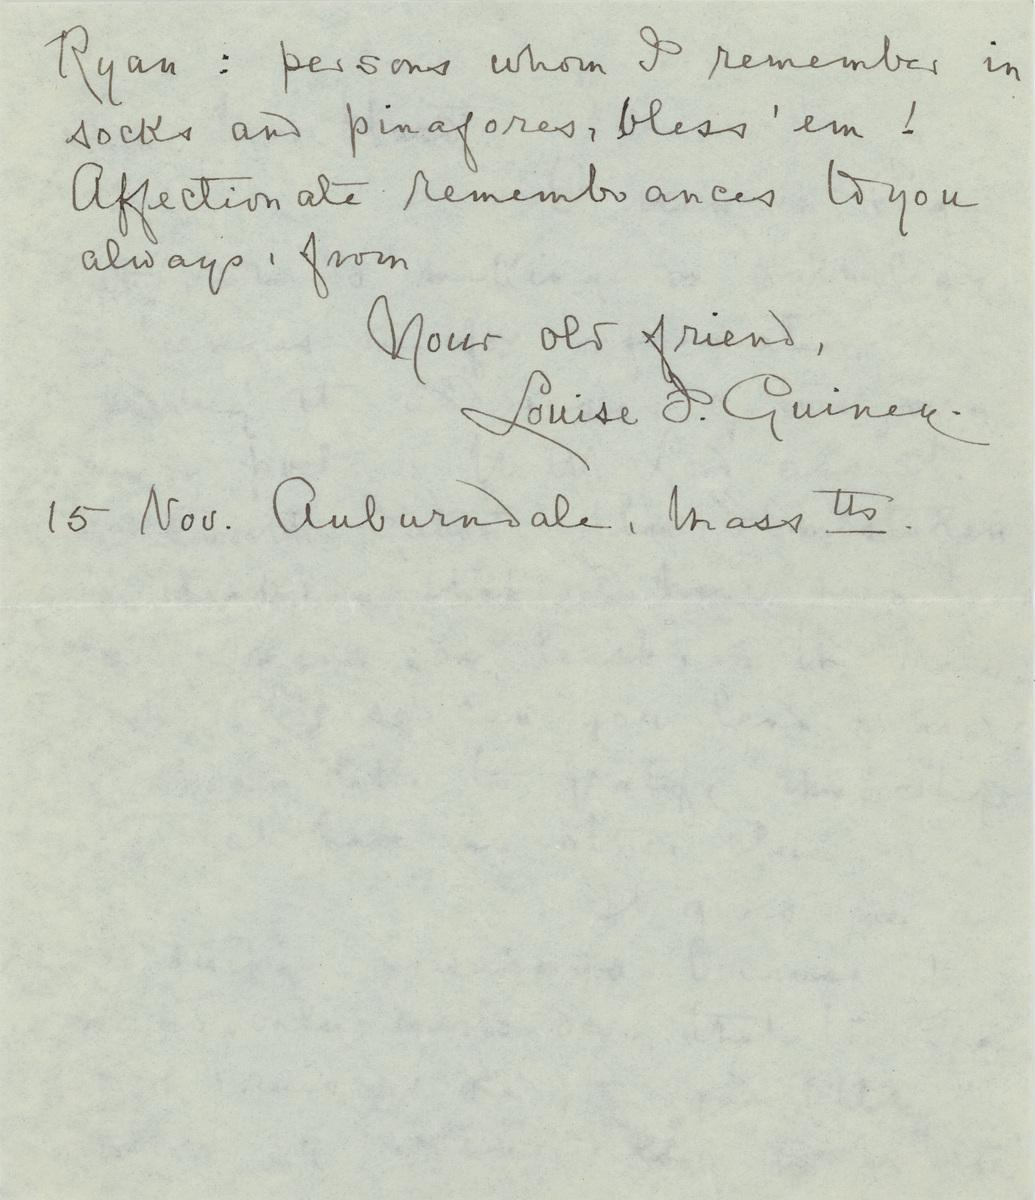 Louise Imogen Guiney letter Mr. Hurd page 2